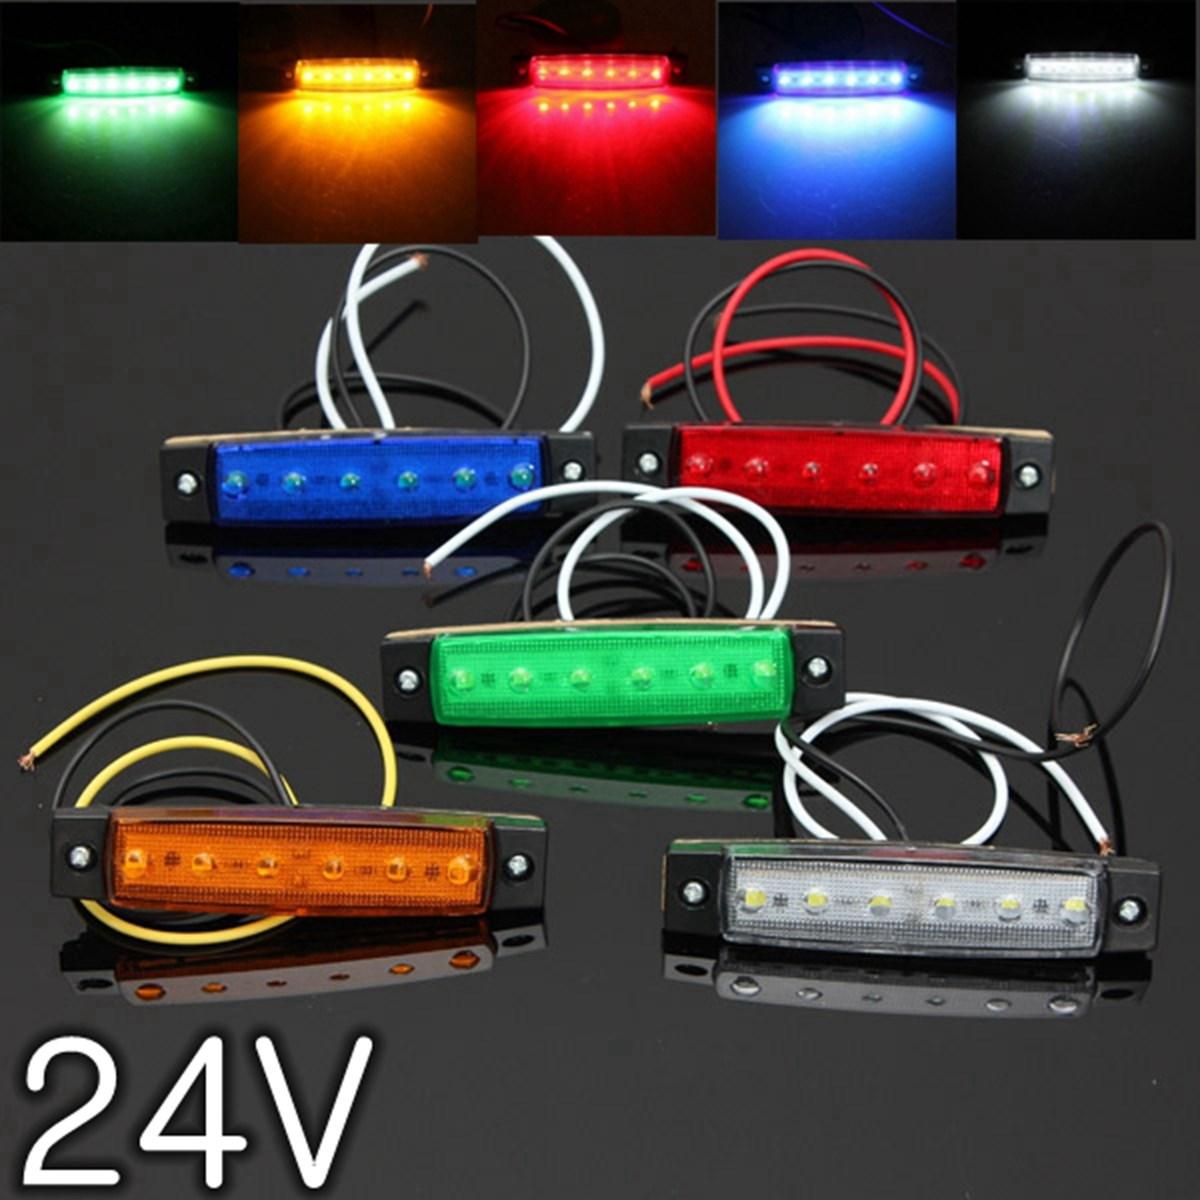 1Pcs 24V 6 SMD LED Car Bus Truck Trailer Lorry Side Marker Indicator Light Side Lamp